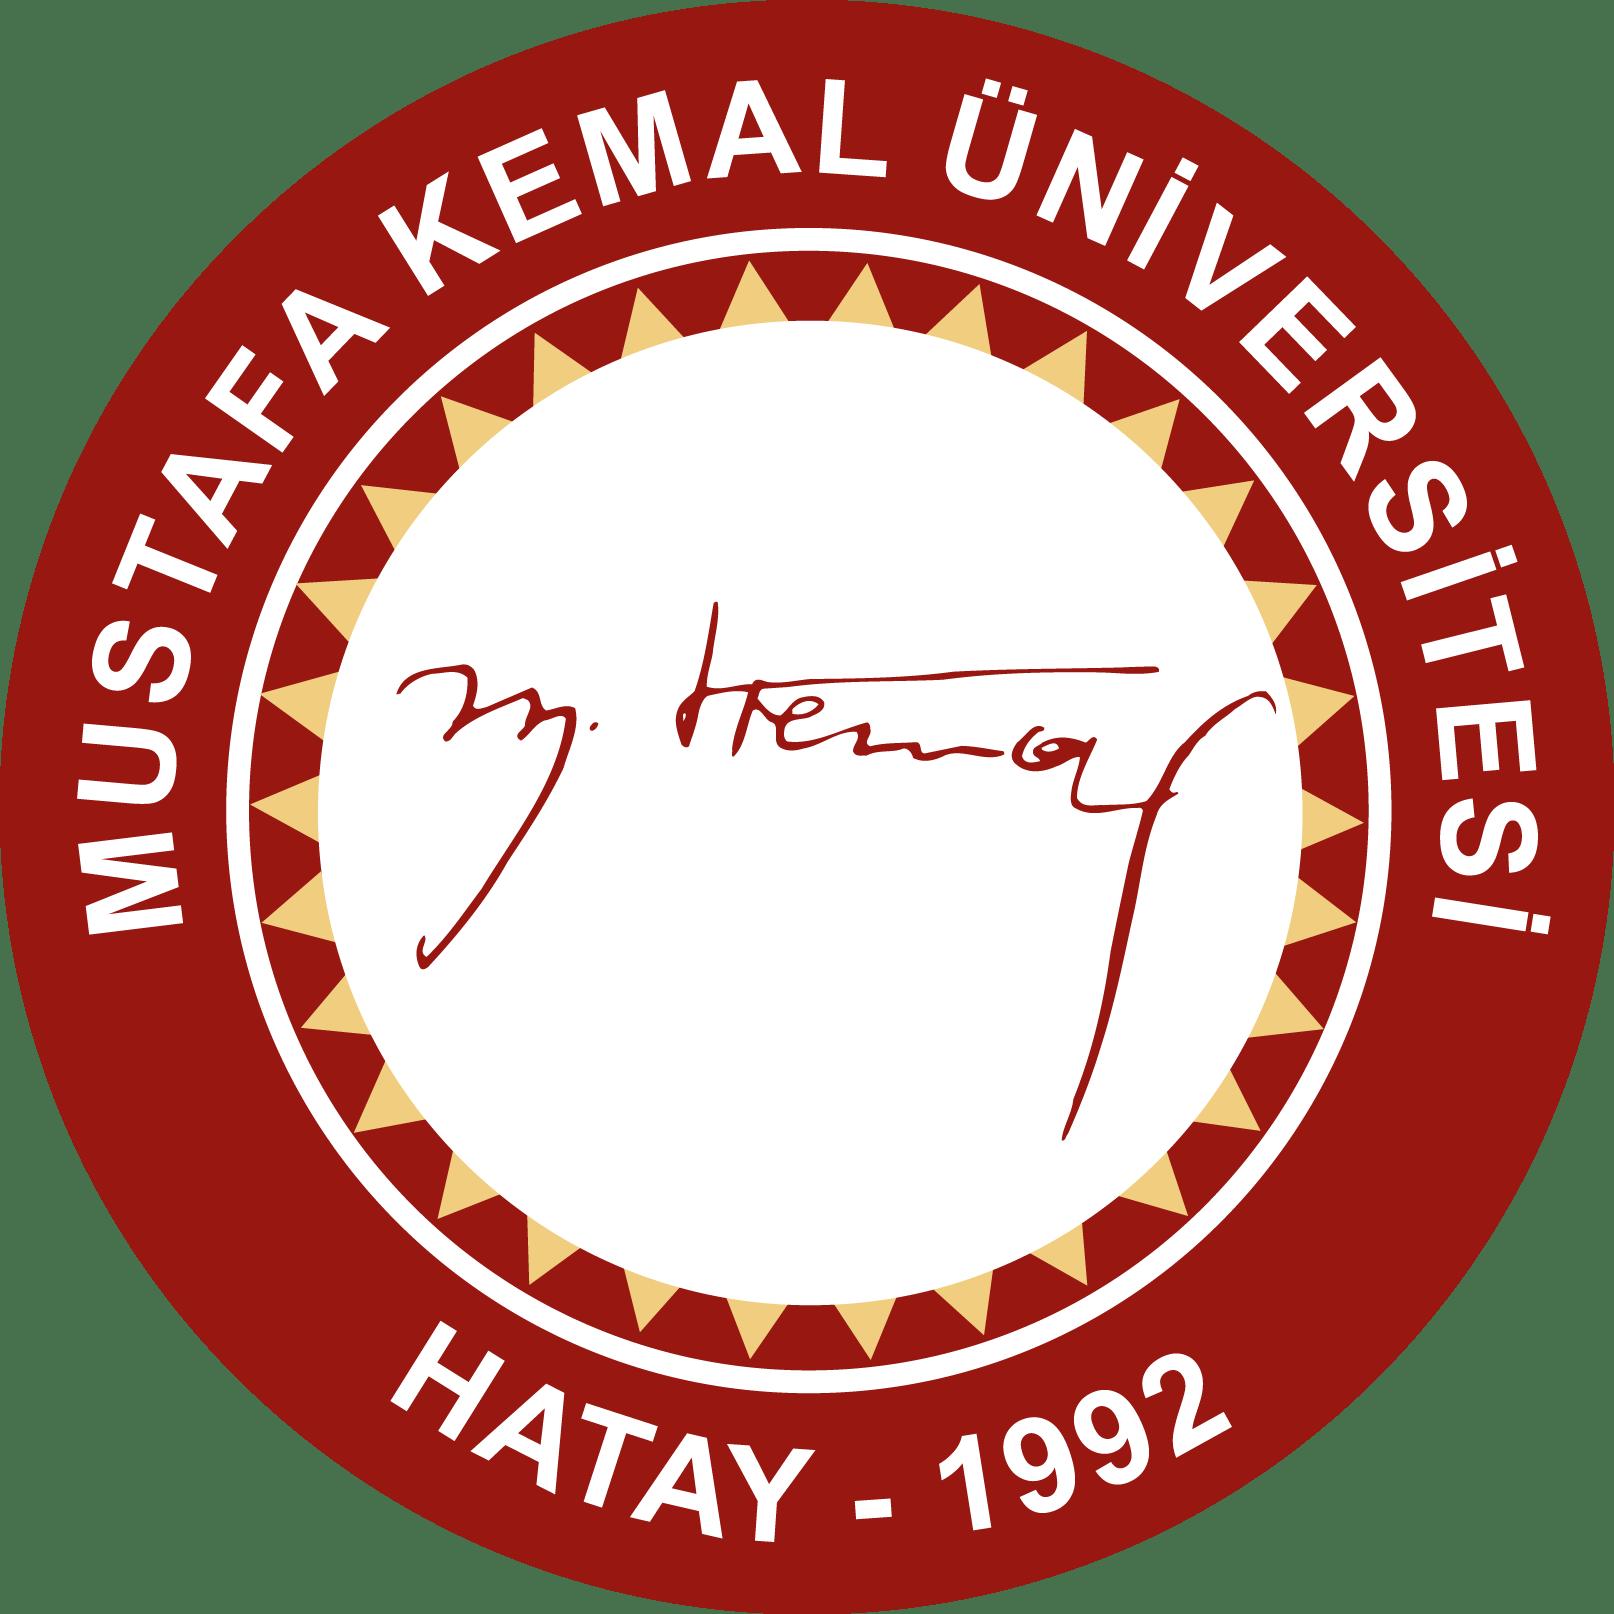 MKÜ – Mustafa Kemal Üniversitesi (Hatay) Logo [mku.edu.tr] png